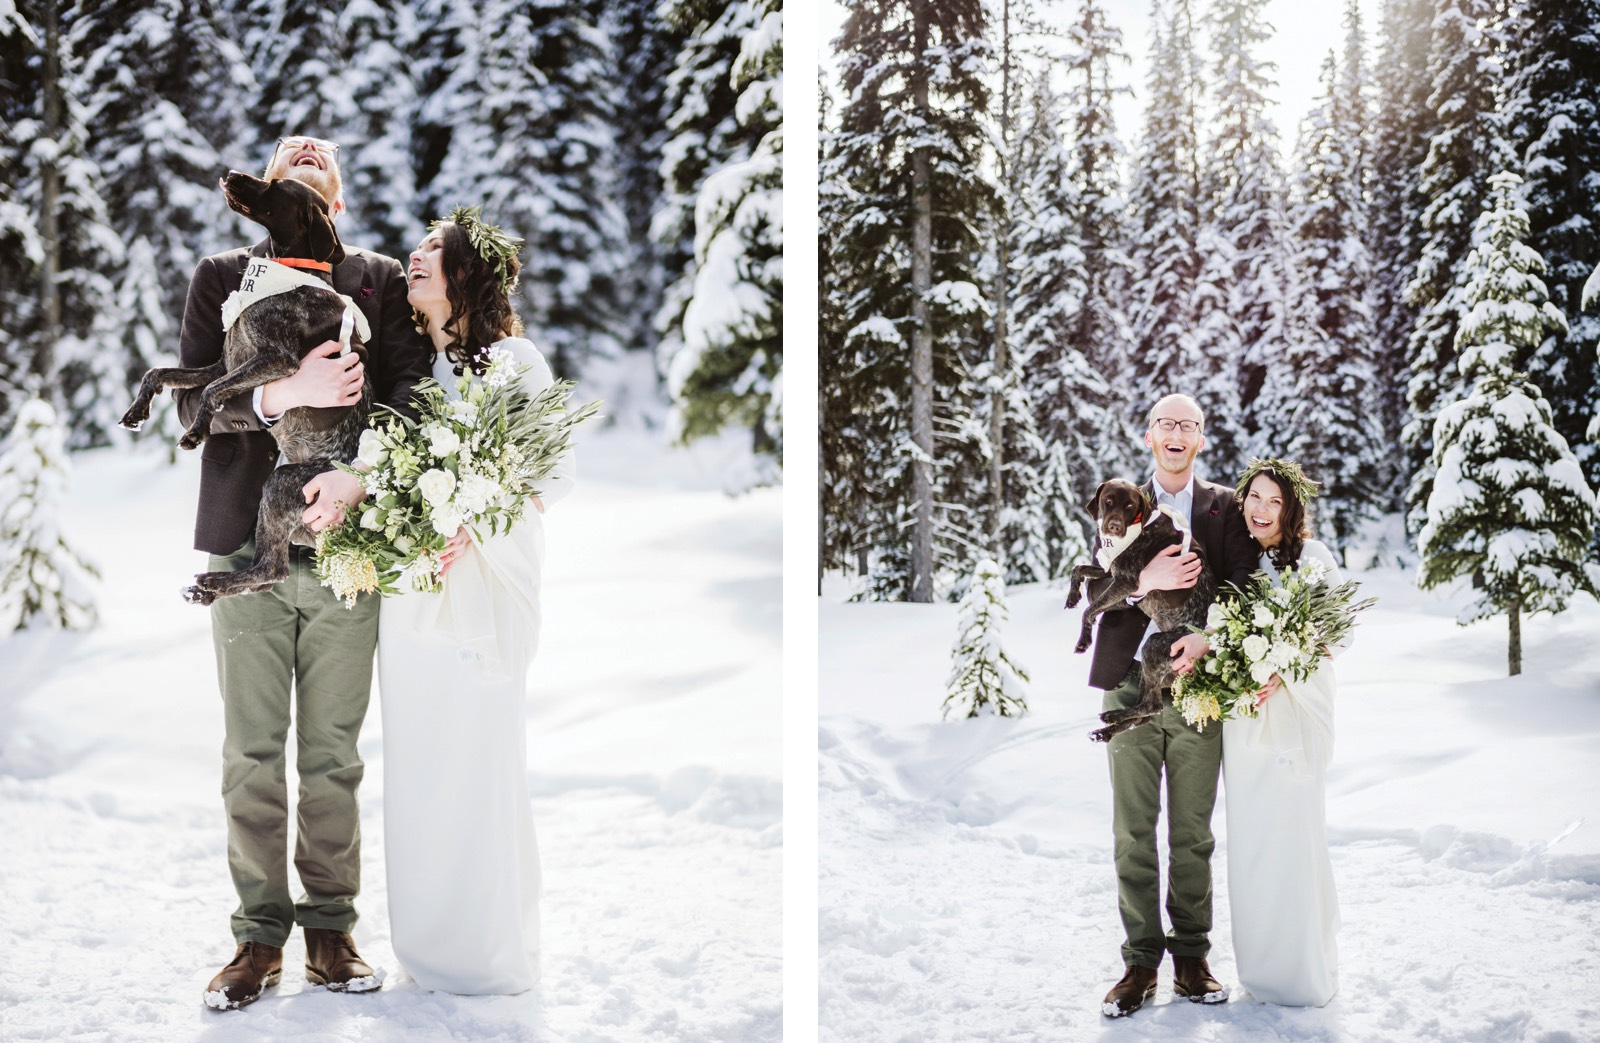 alpine-lakes-high-camp-winter-wedding-45 ALPINE LAKES HIGH CAMP WEDDING